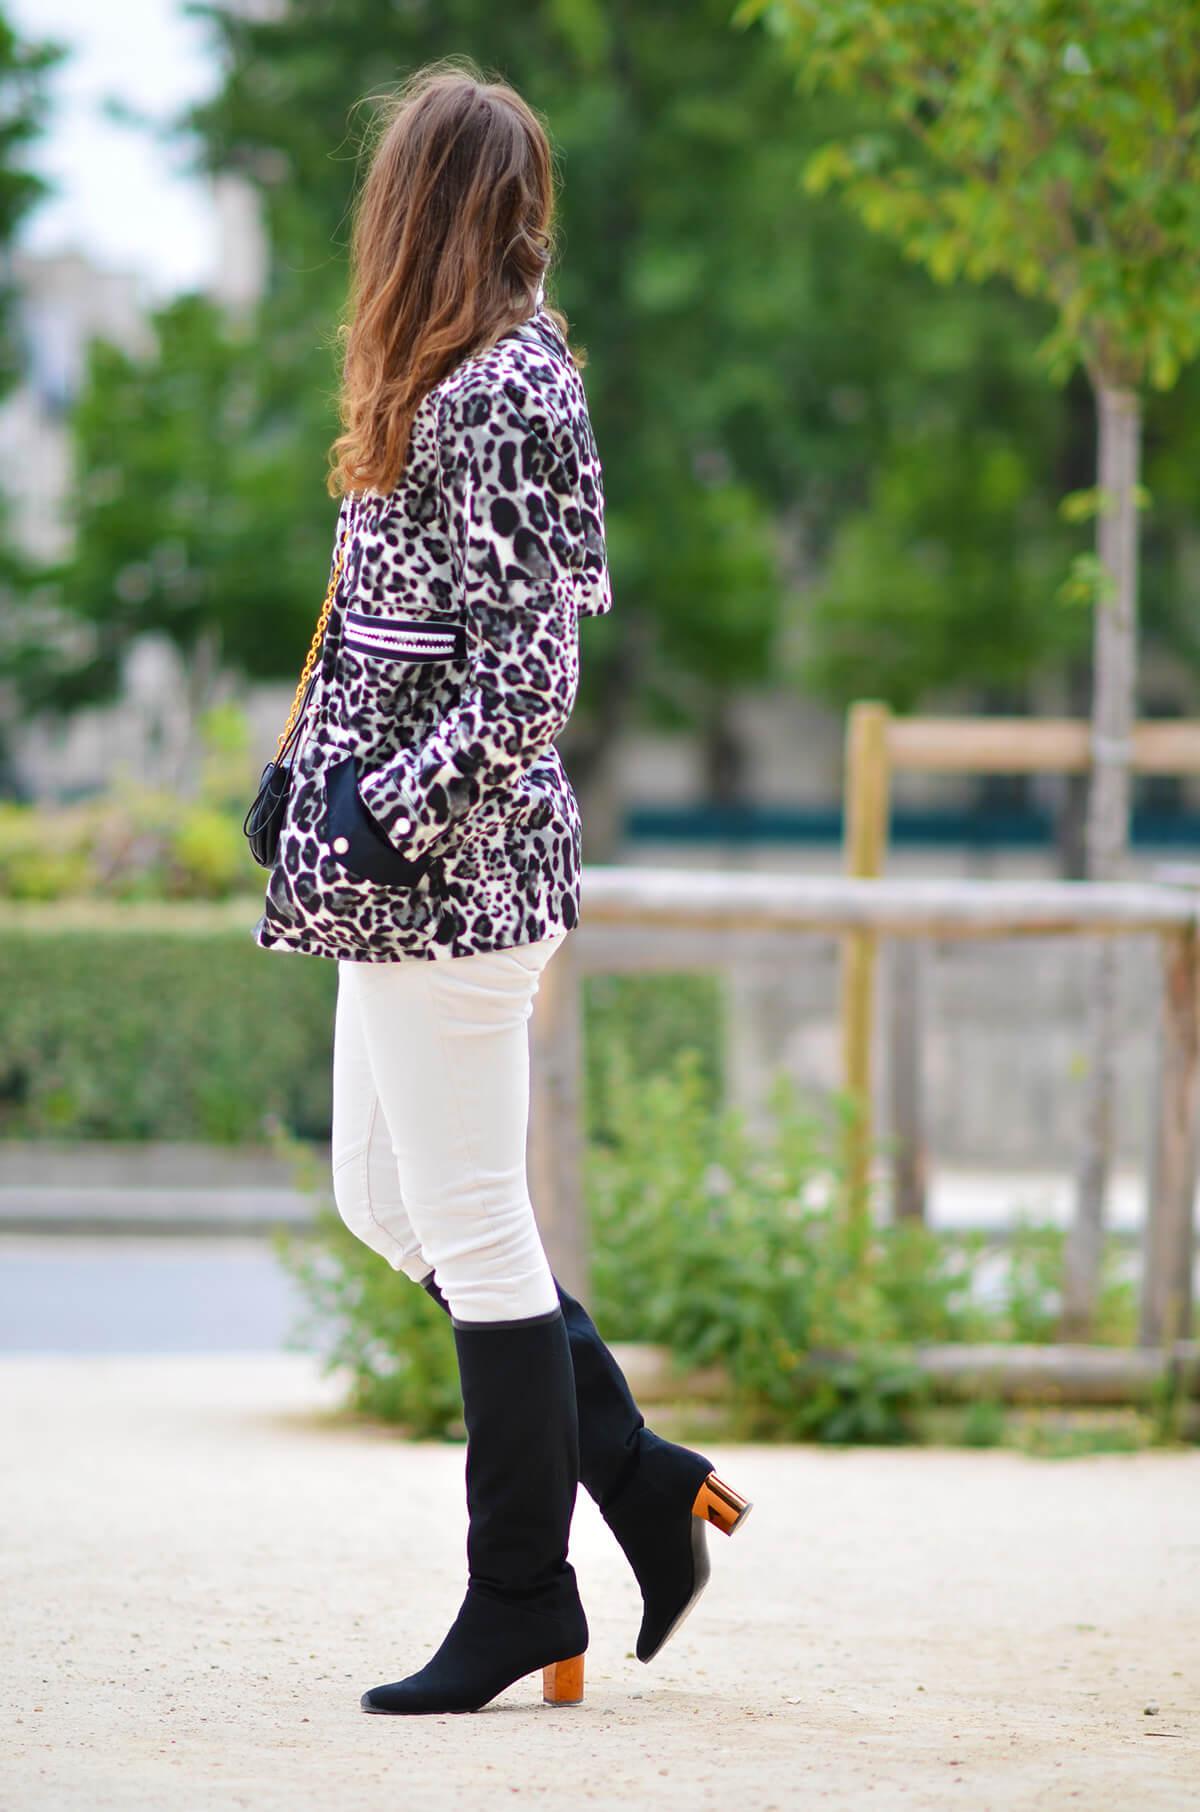 The Wild Parisian parka leopard